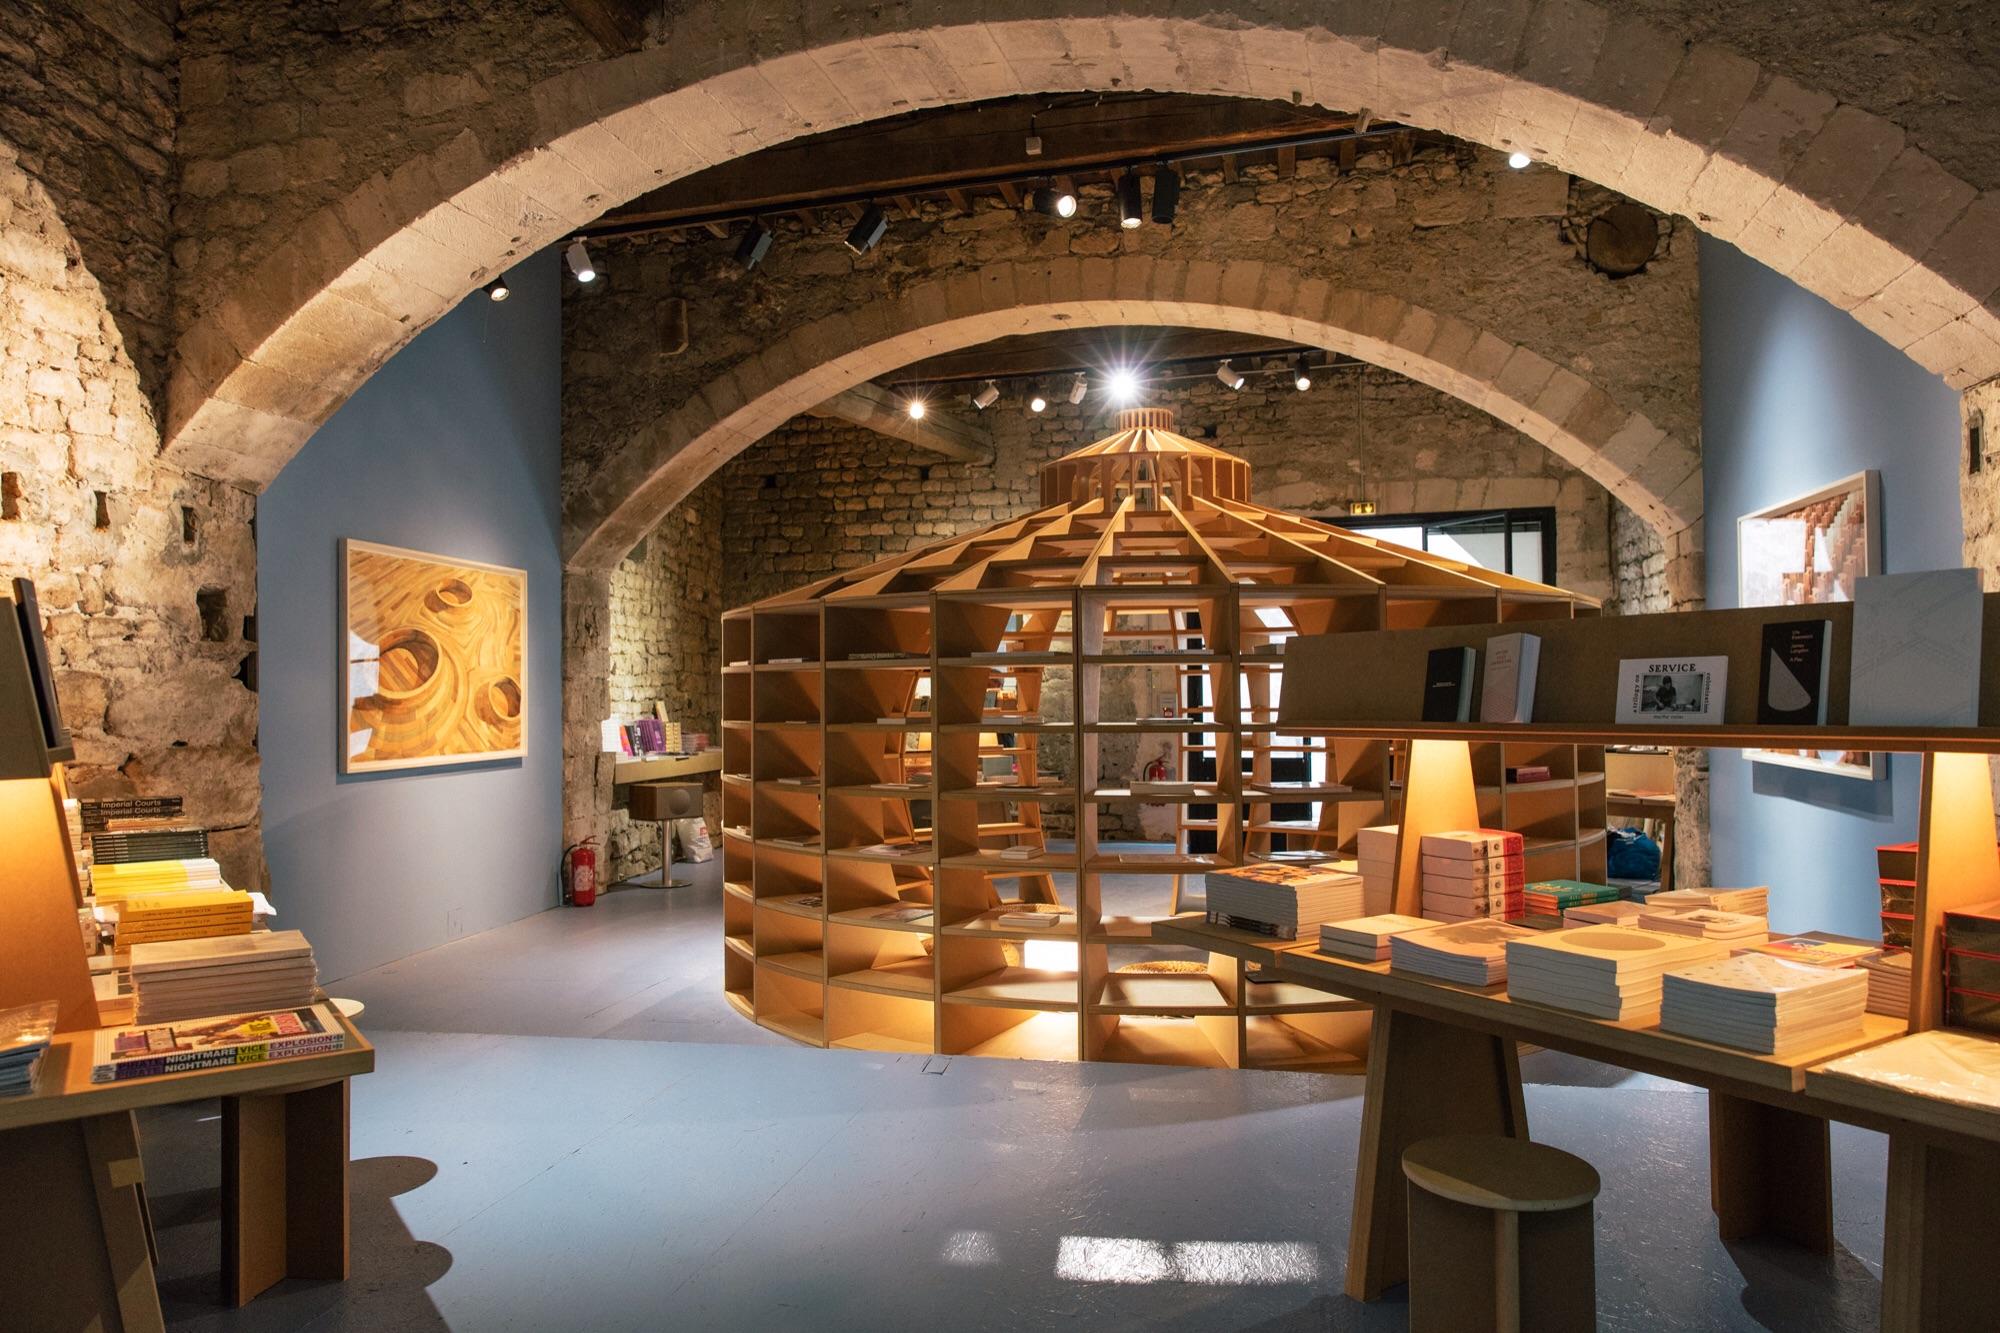 All imagesCourtesy of the LUMA Foundation, Offprint Library Arles, LUMA Arles 2016  Images (c) Victor Picon